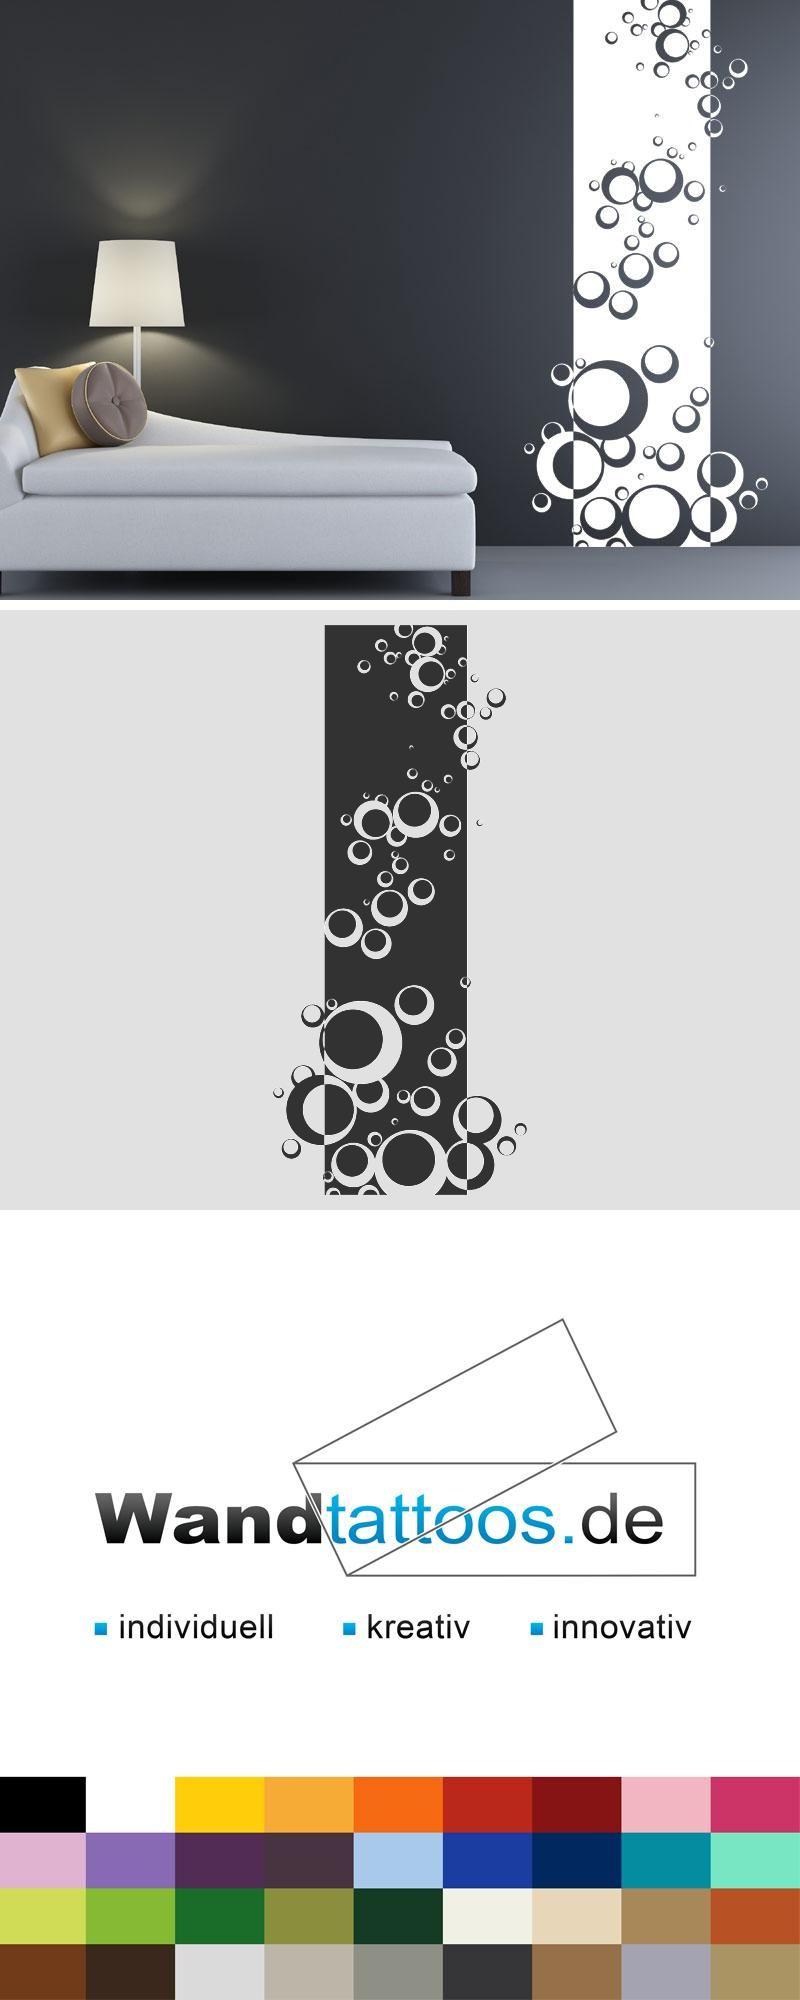 Wandbanner kreise wandtattoo raumhoch muster kreise - Wandgestaltung kreise ...